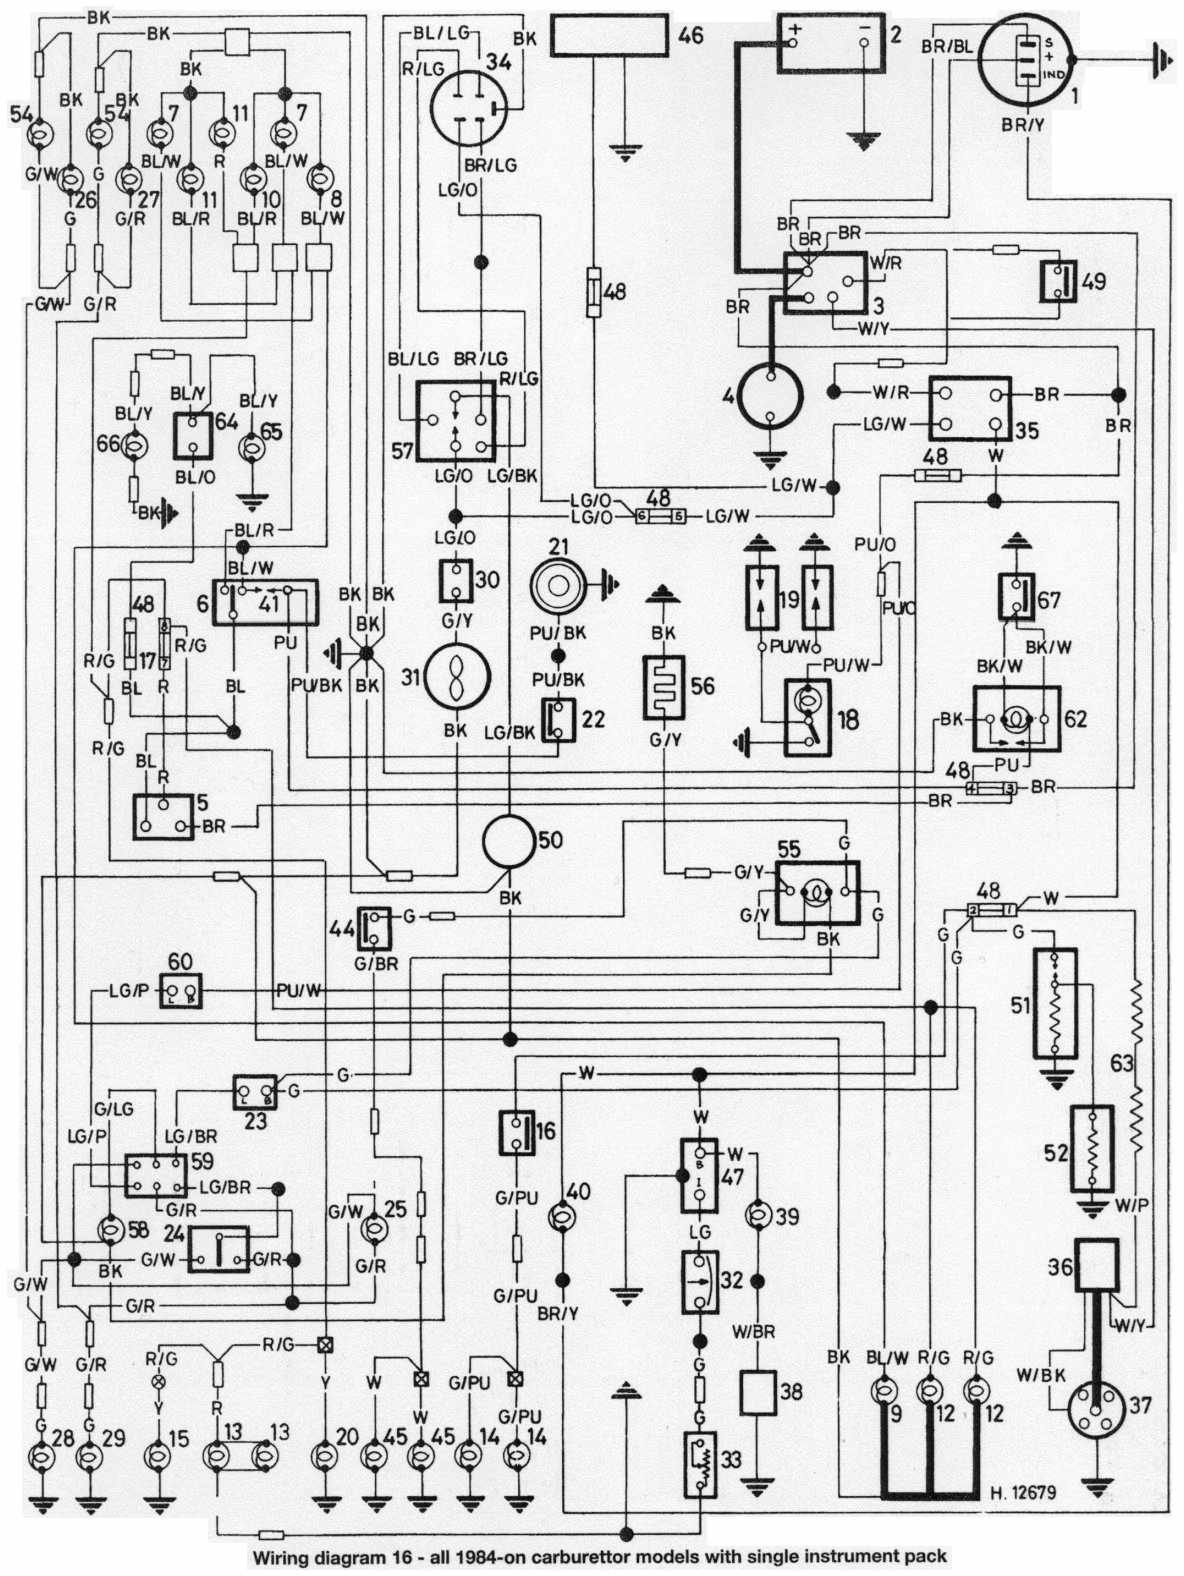 1000d14g07 Cooper Ballast Wiring Diagram Diagrams Schematic Fluorescent Name Ge